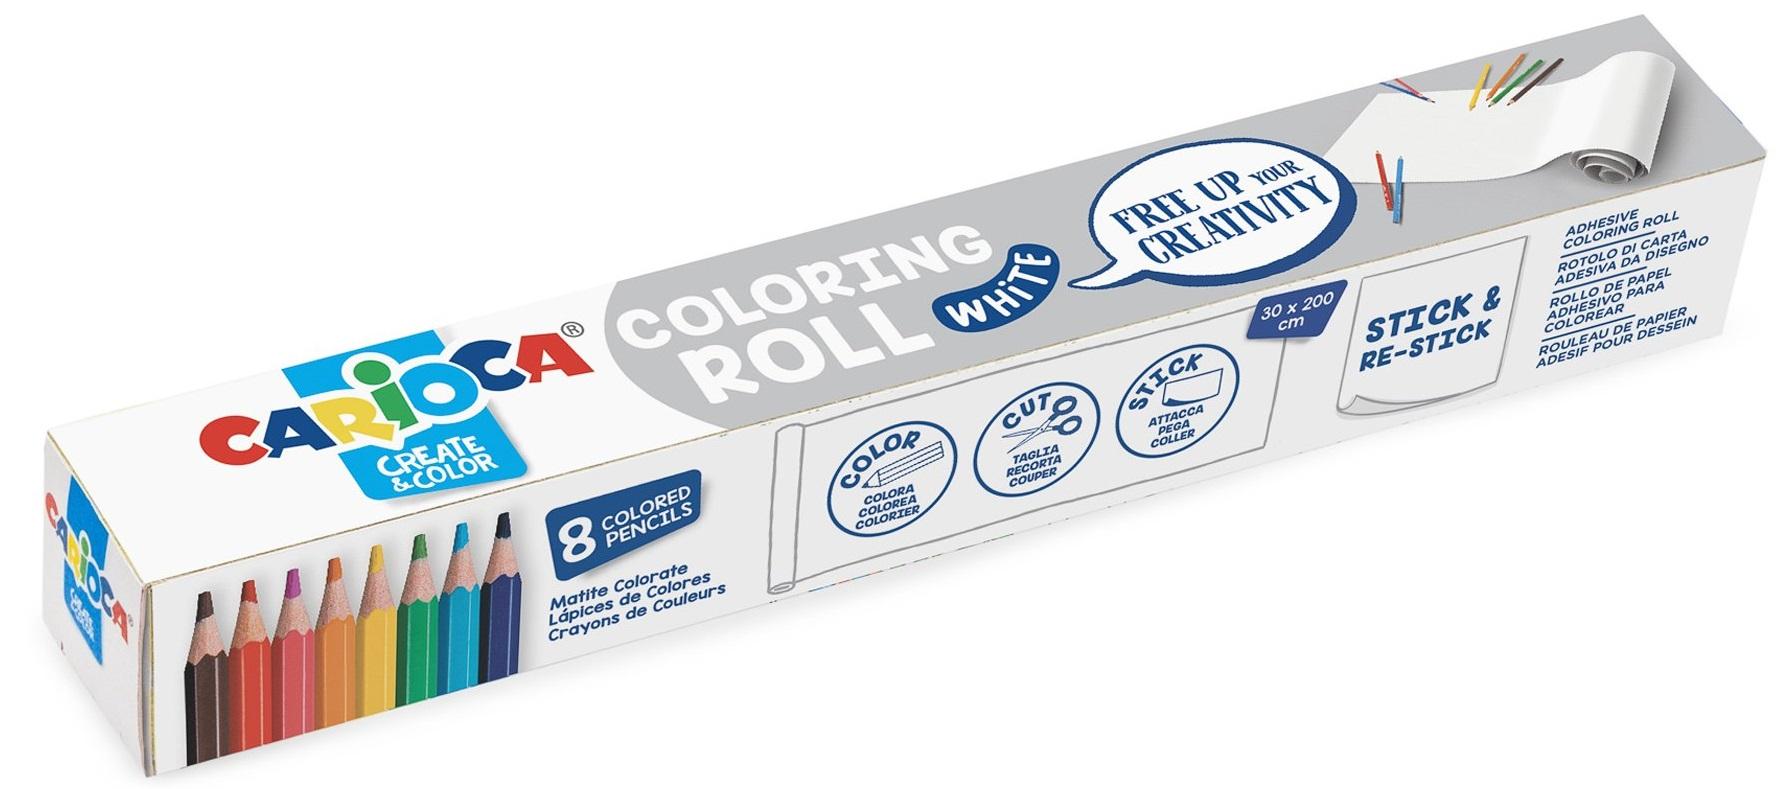 CARIOCA Coloring Roll, 30 x 198 cm/rola, hartie autoadeziva - White